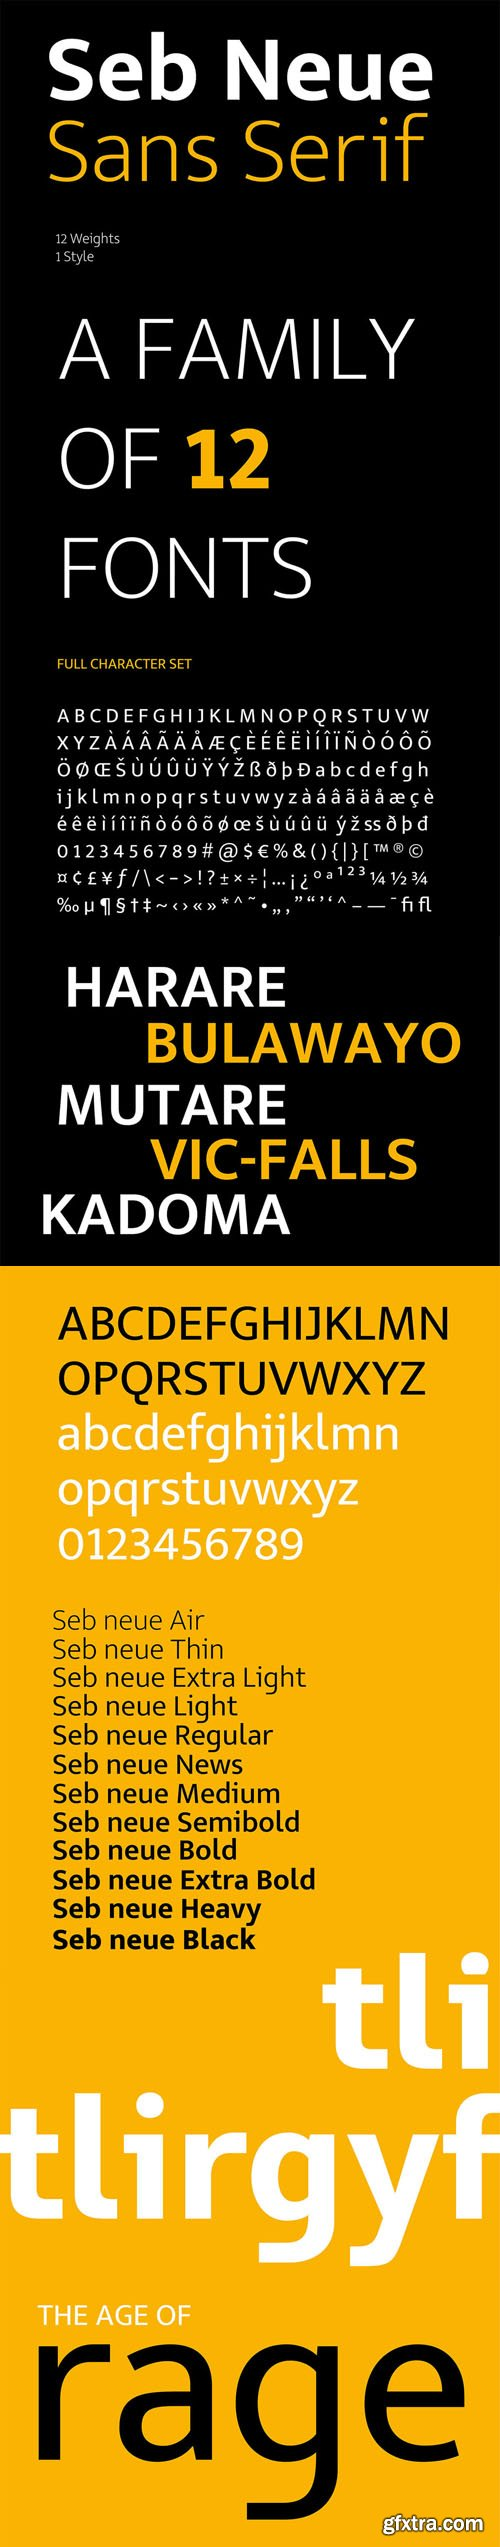 Seb Neue Sans Serif Font (12-Weights)